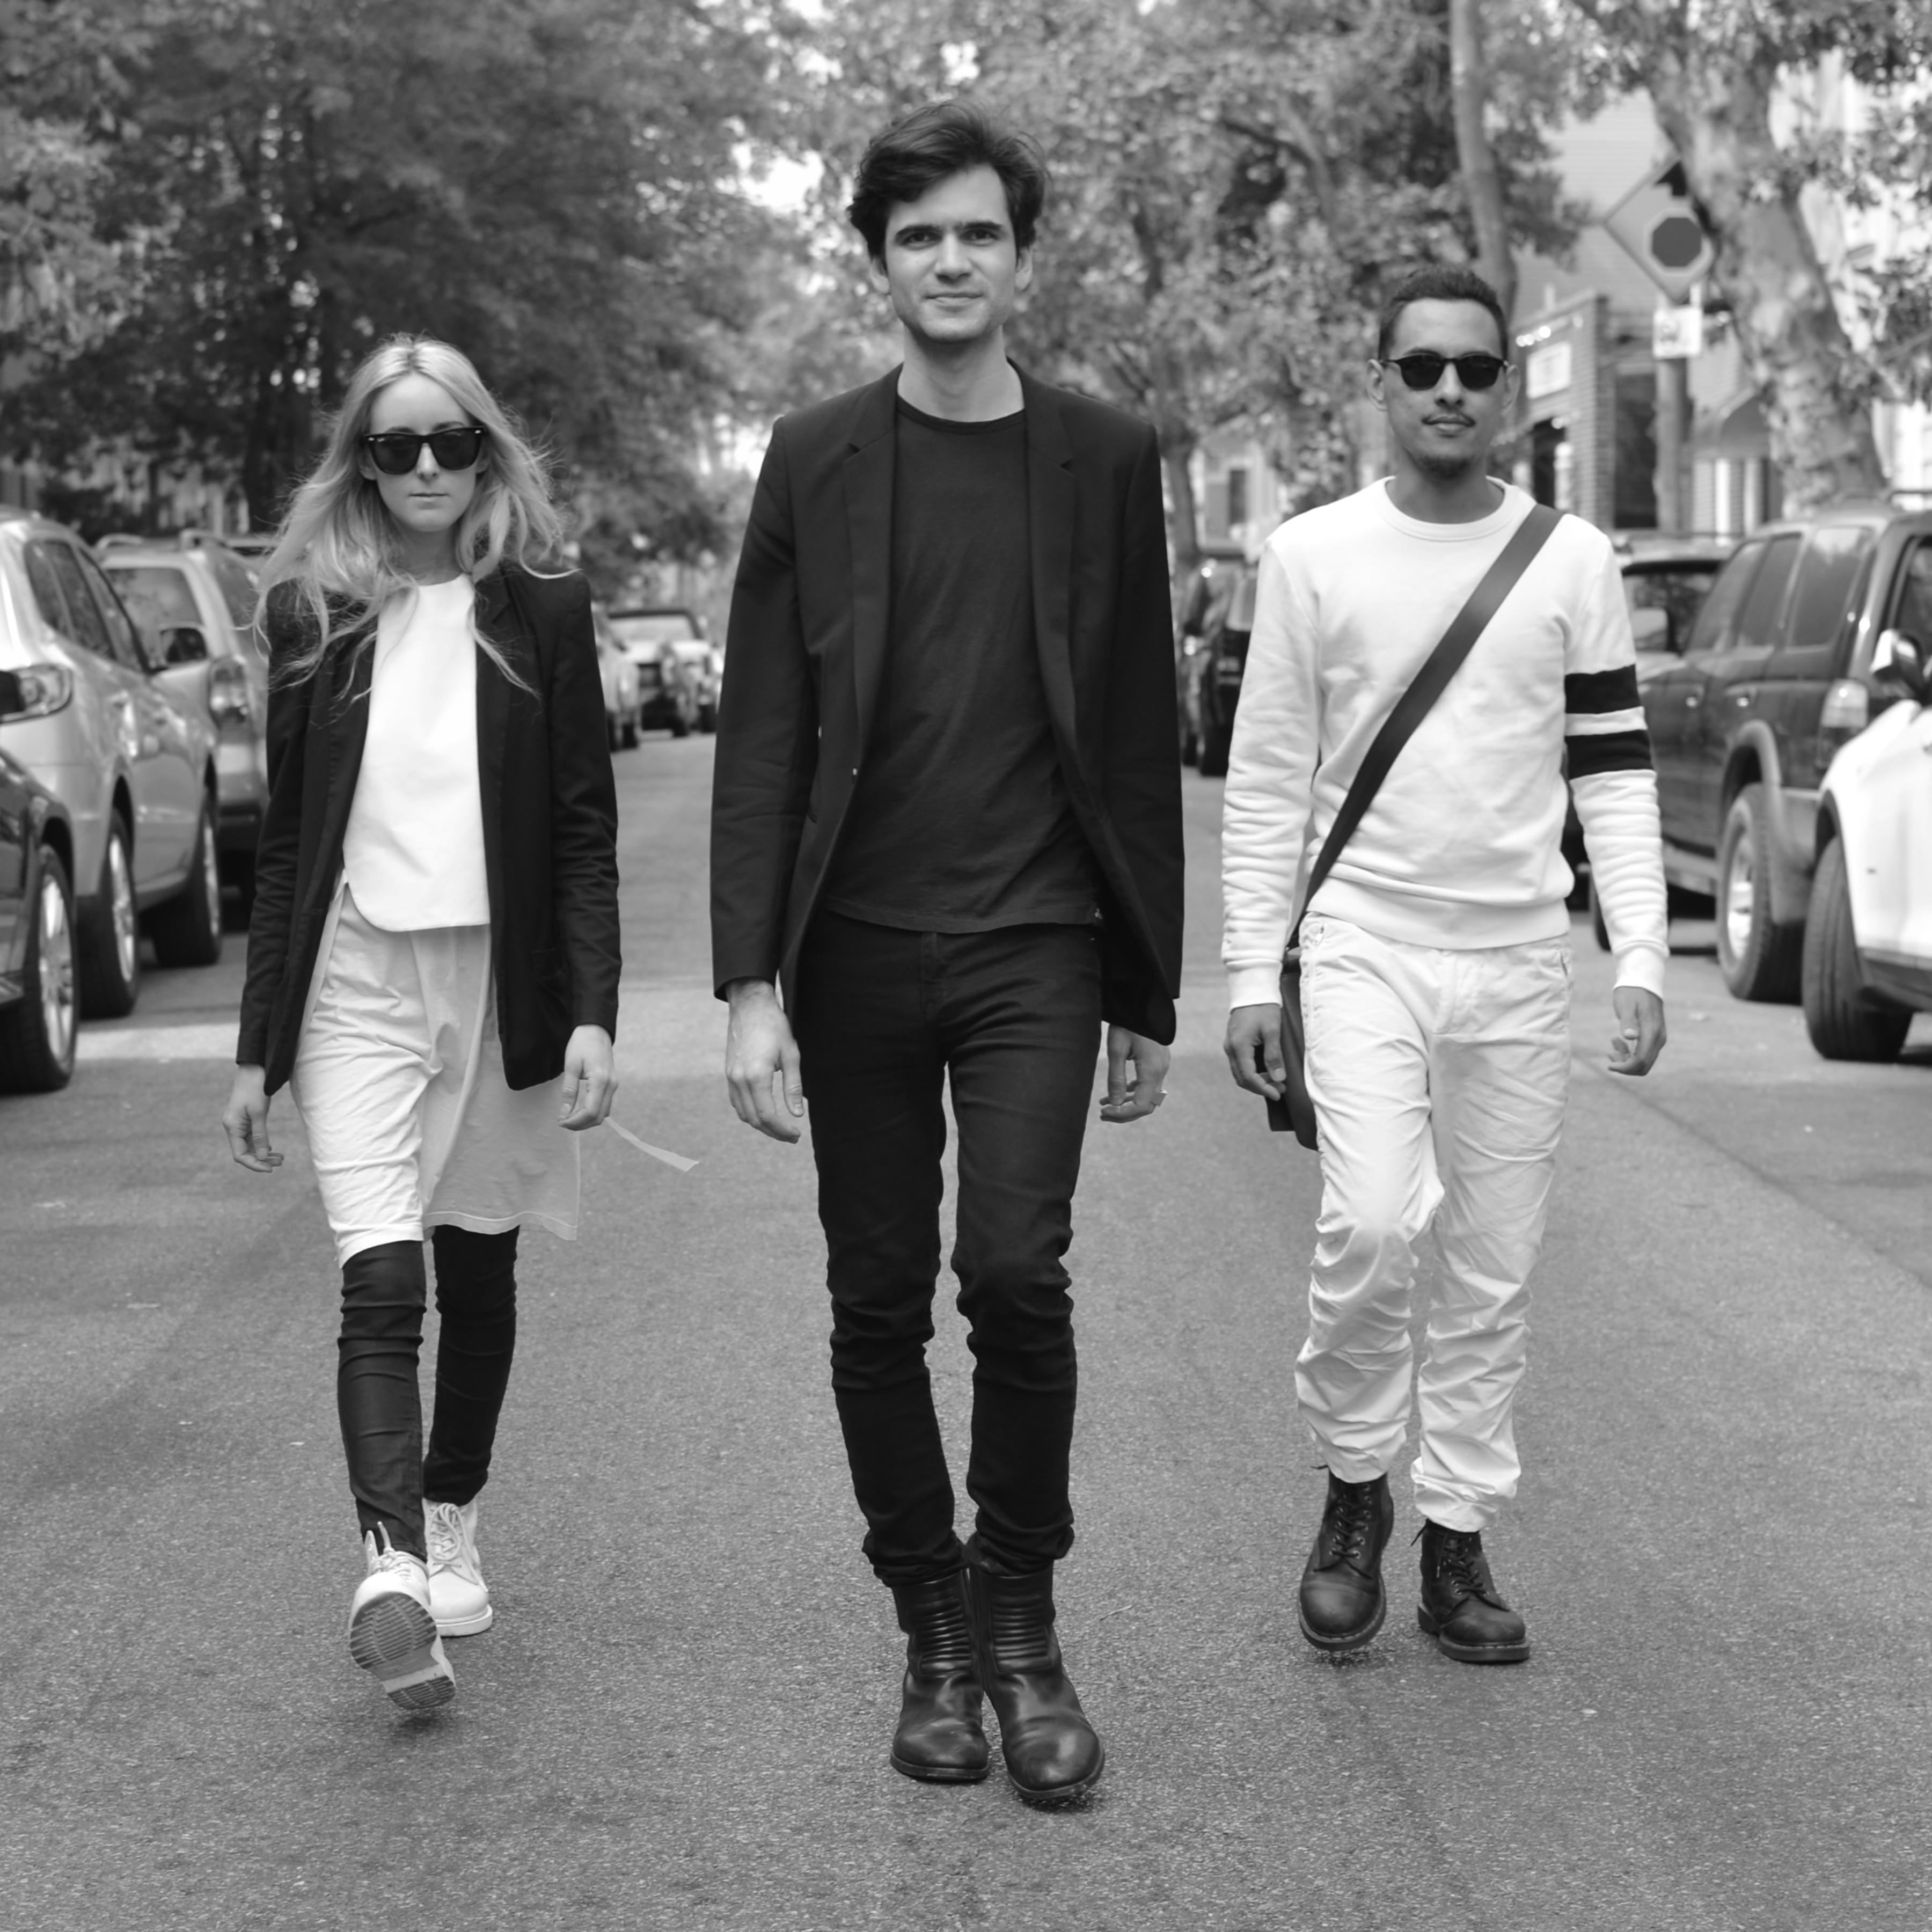 three people walking on NYC street